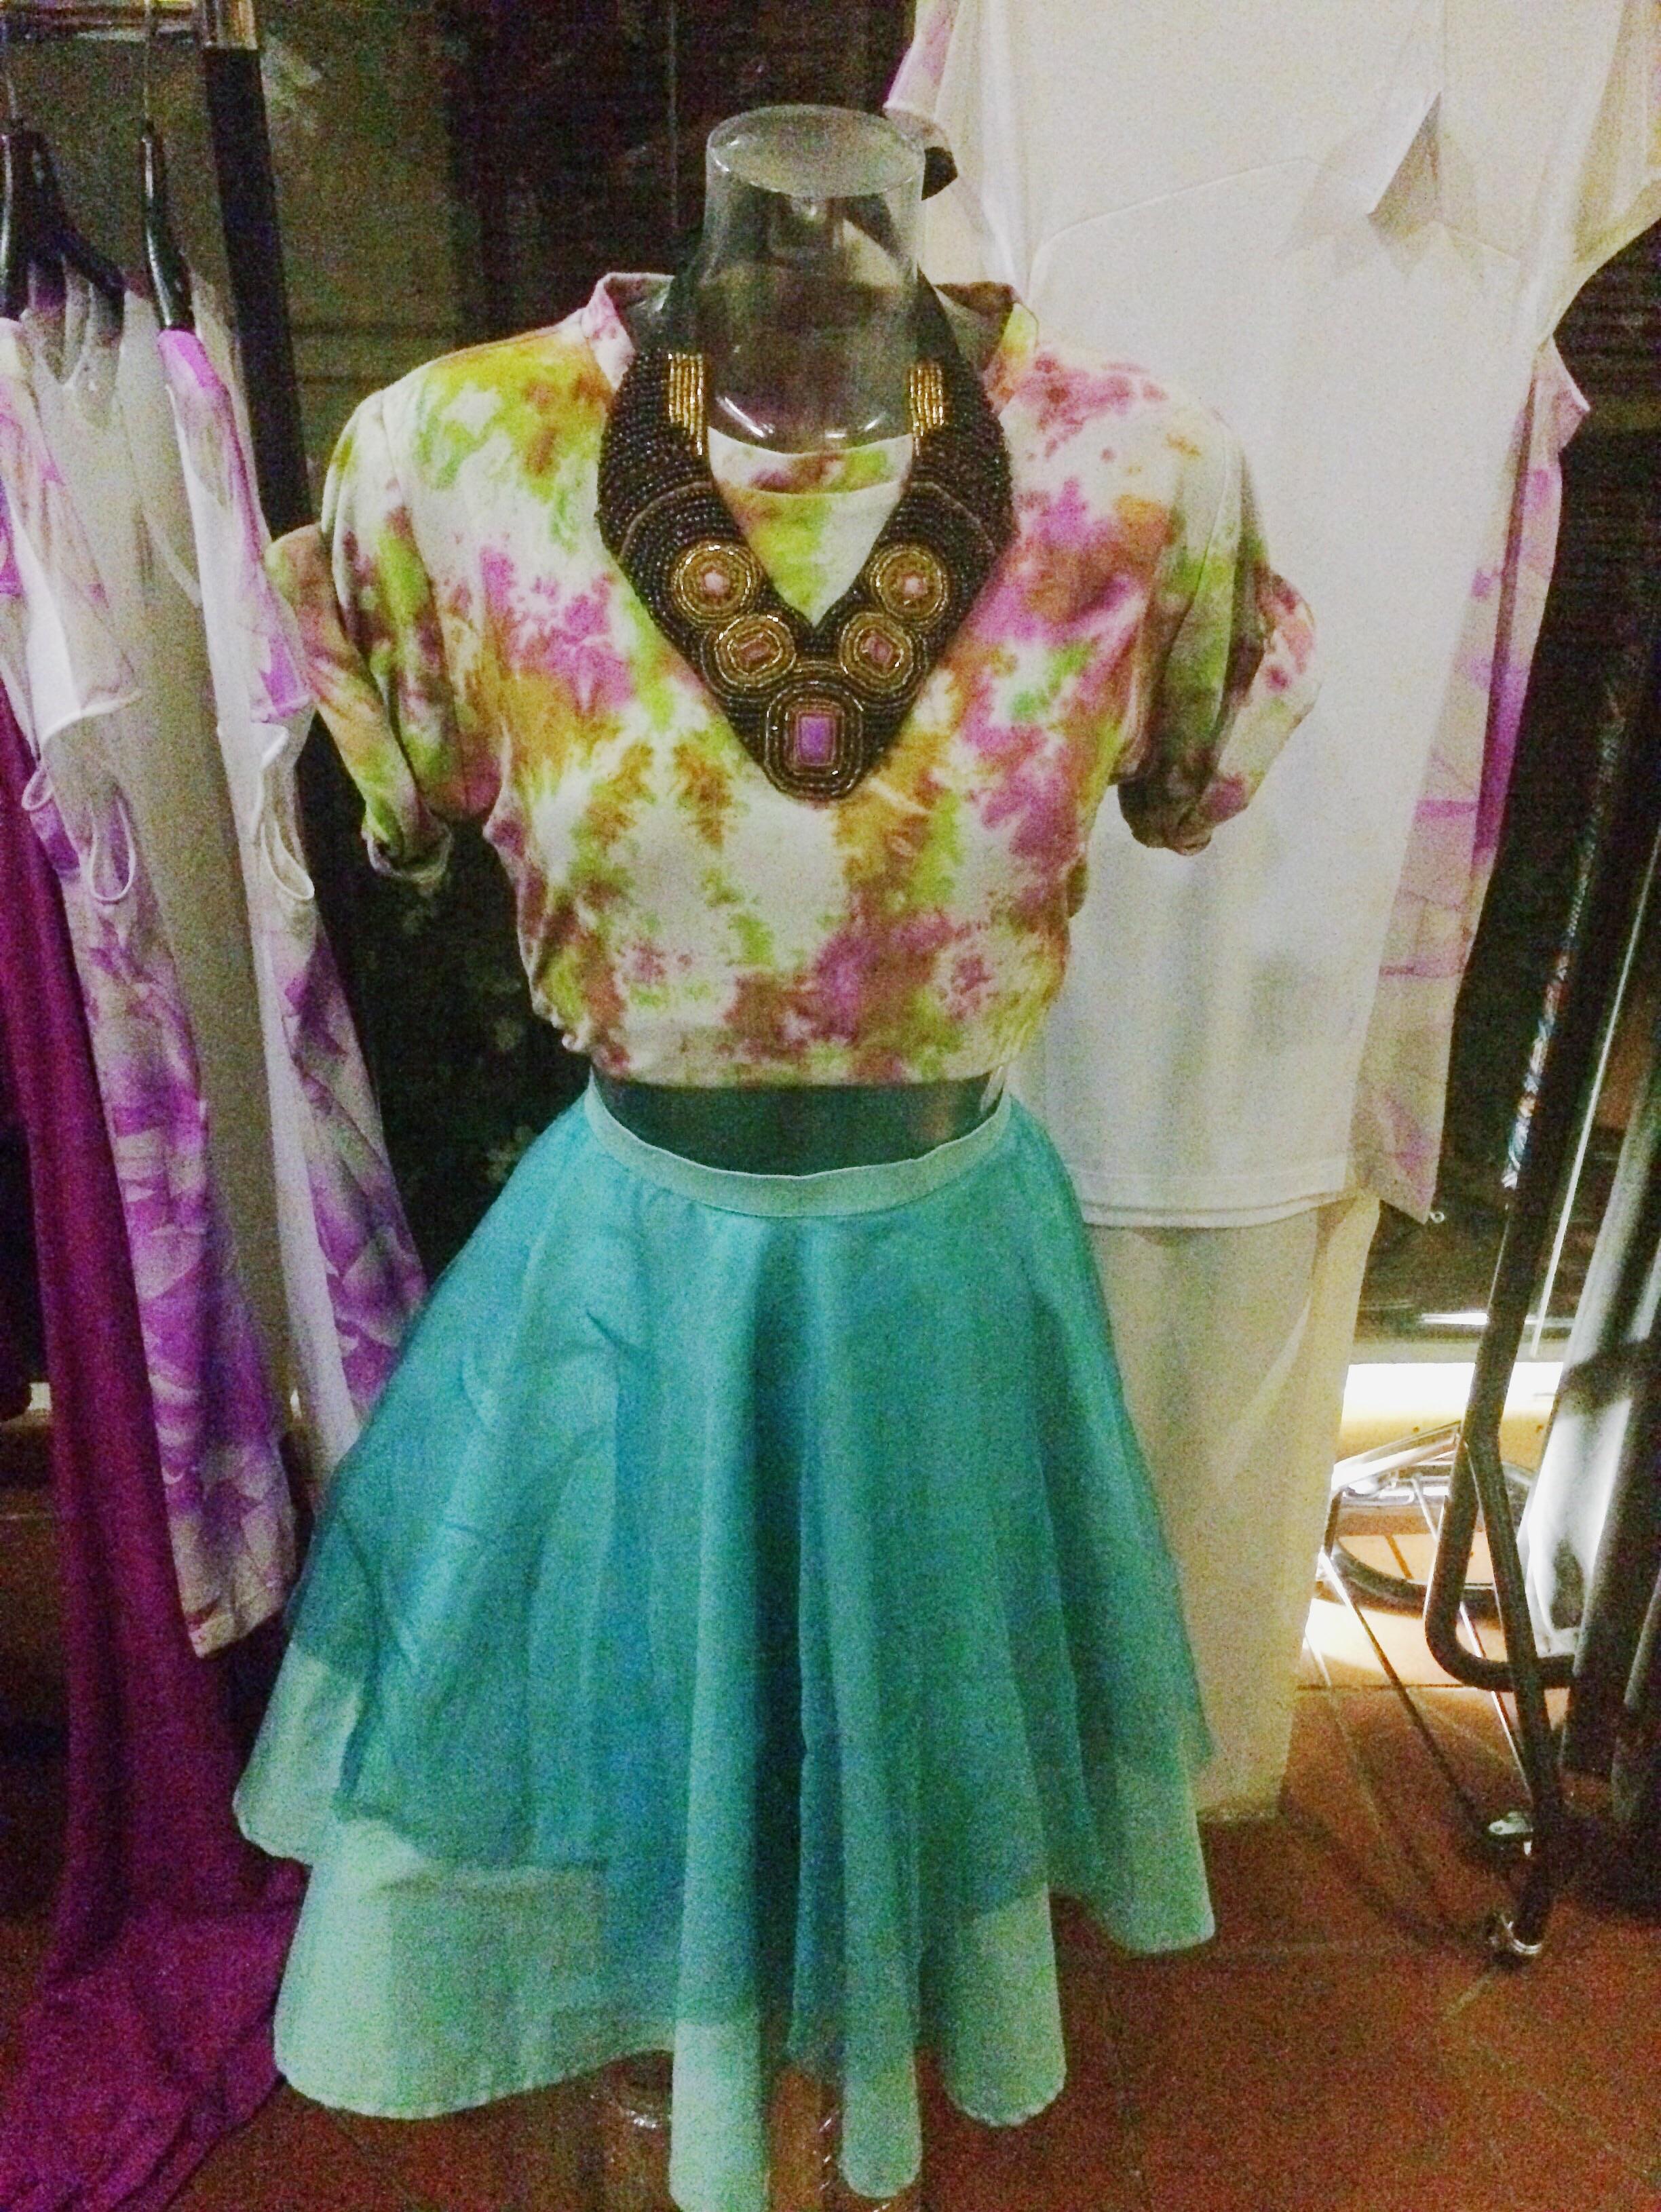 Dress by Ameyo